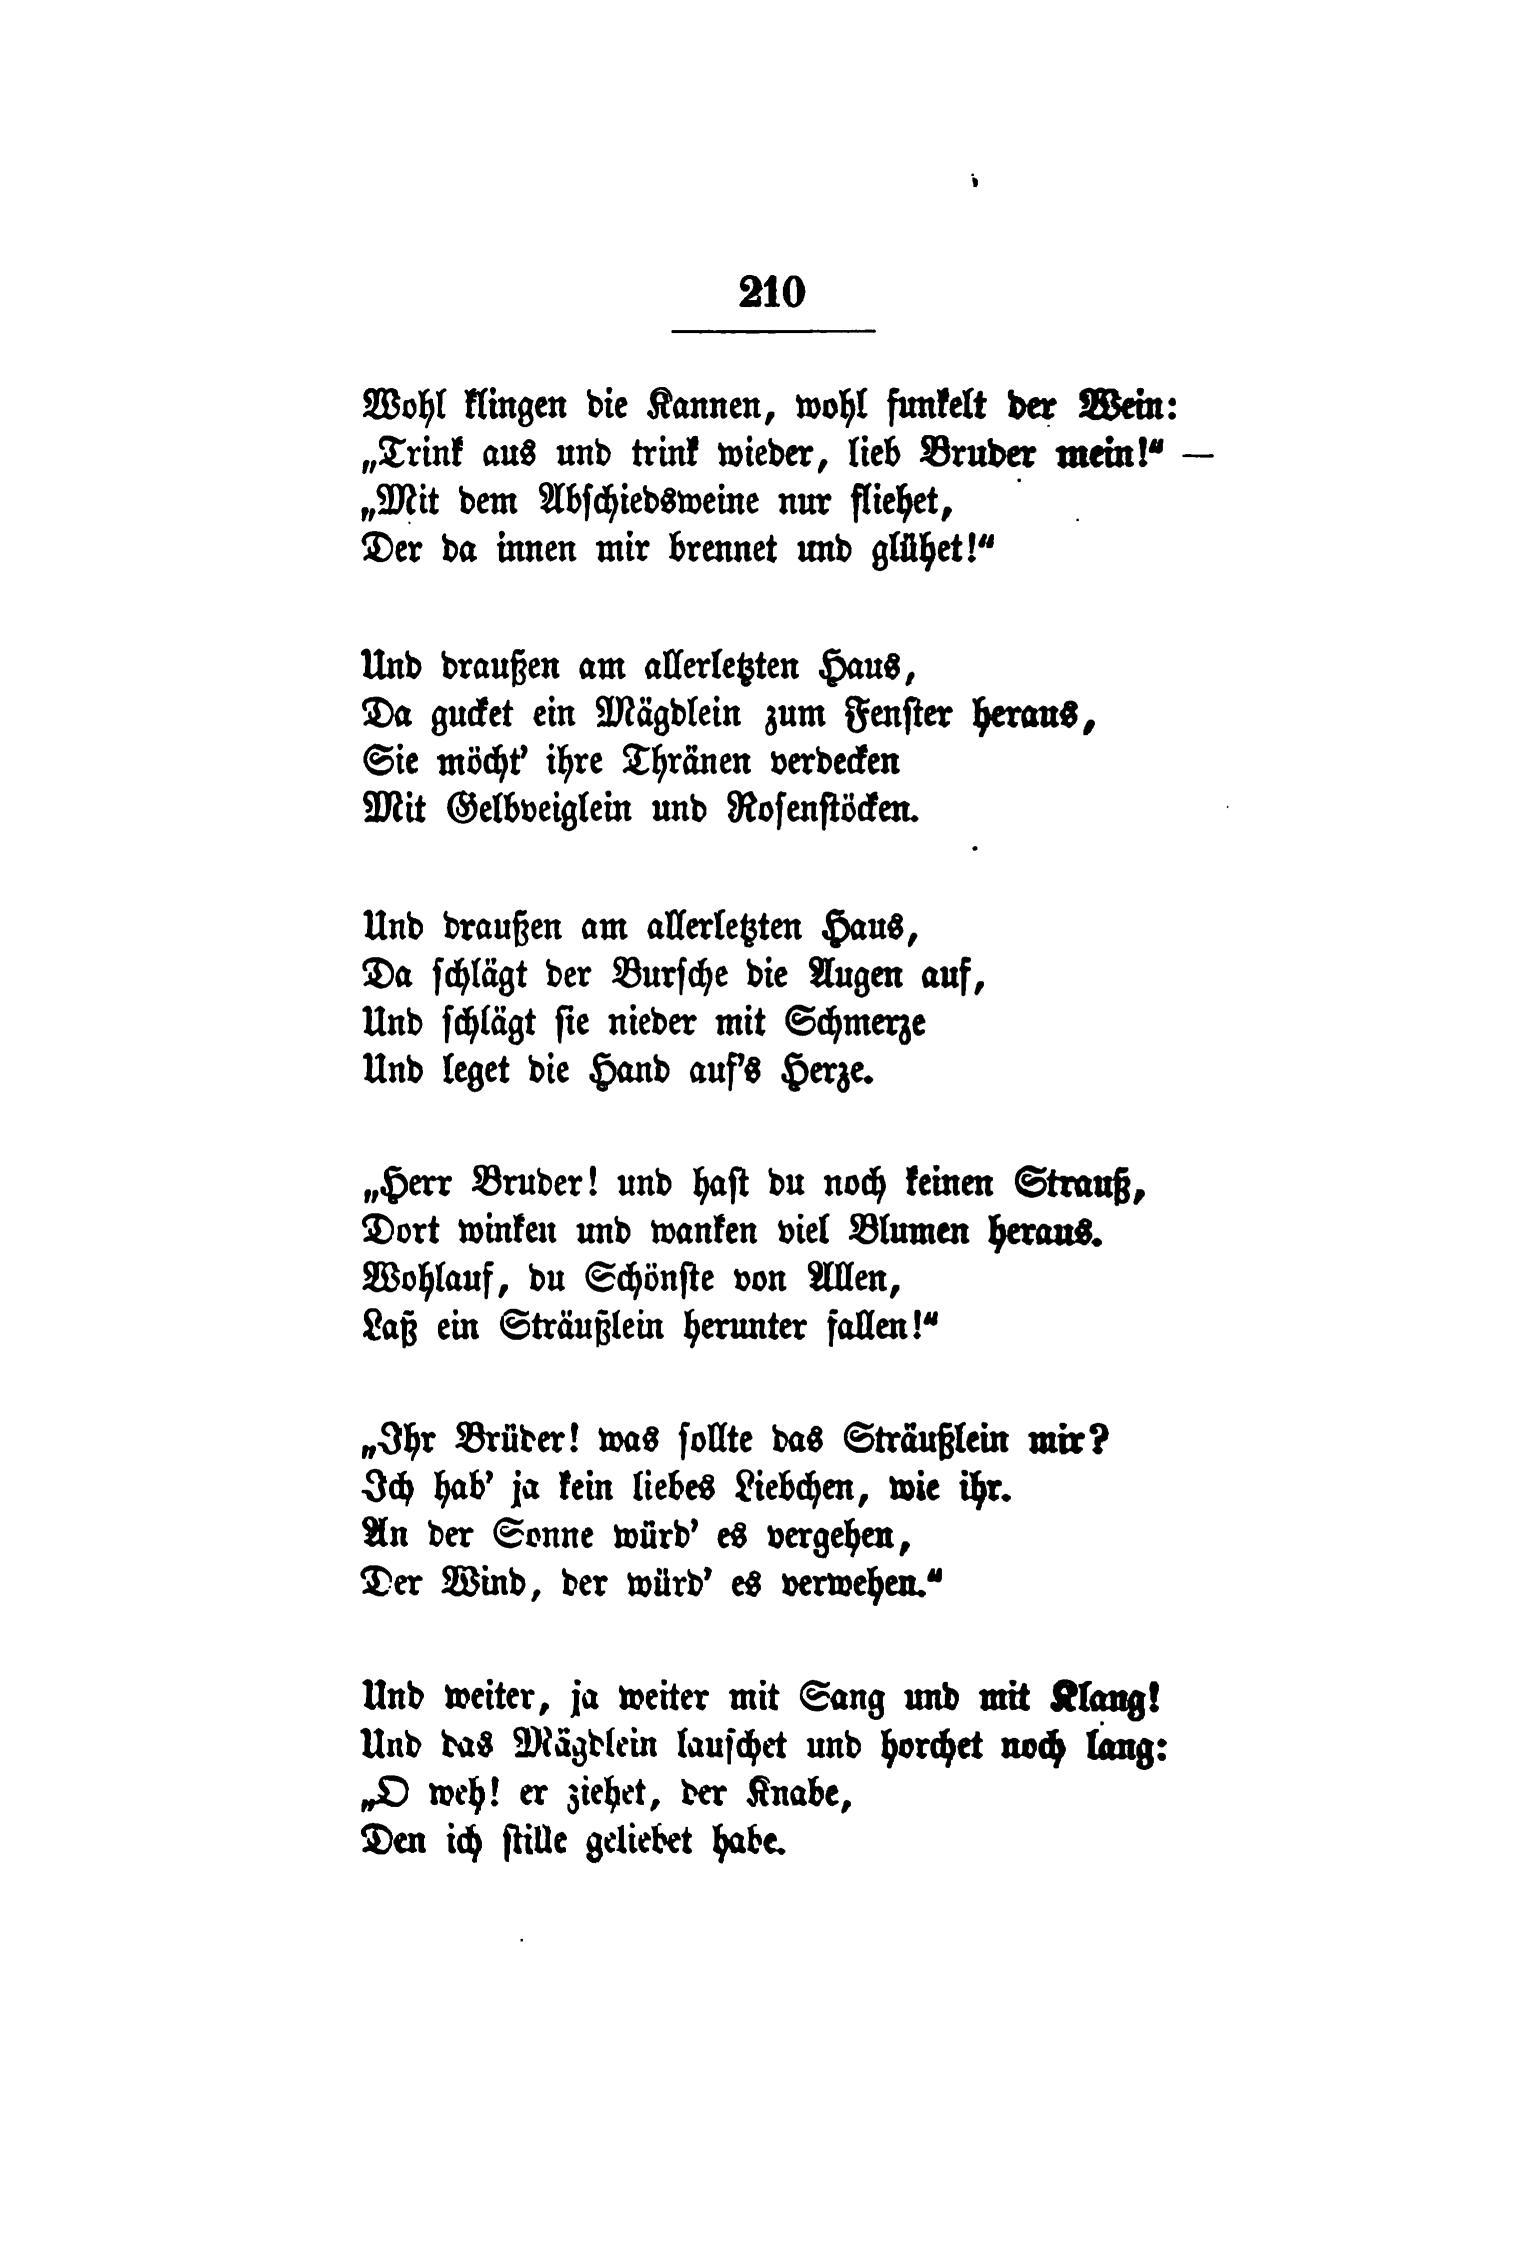 File:De Gedichte (Uhland) 228.jpg - Wikimedia Commons